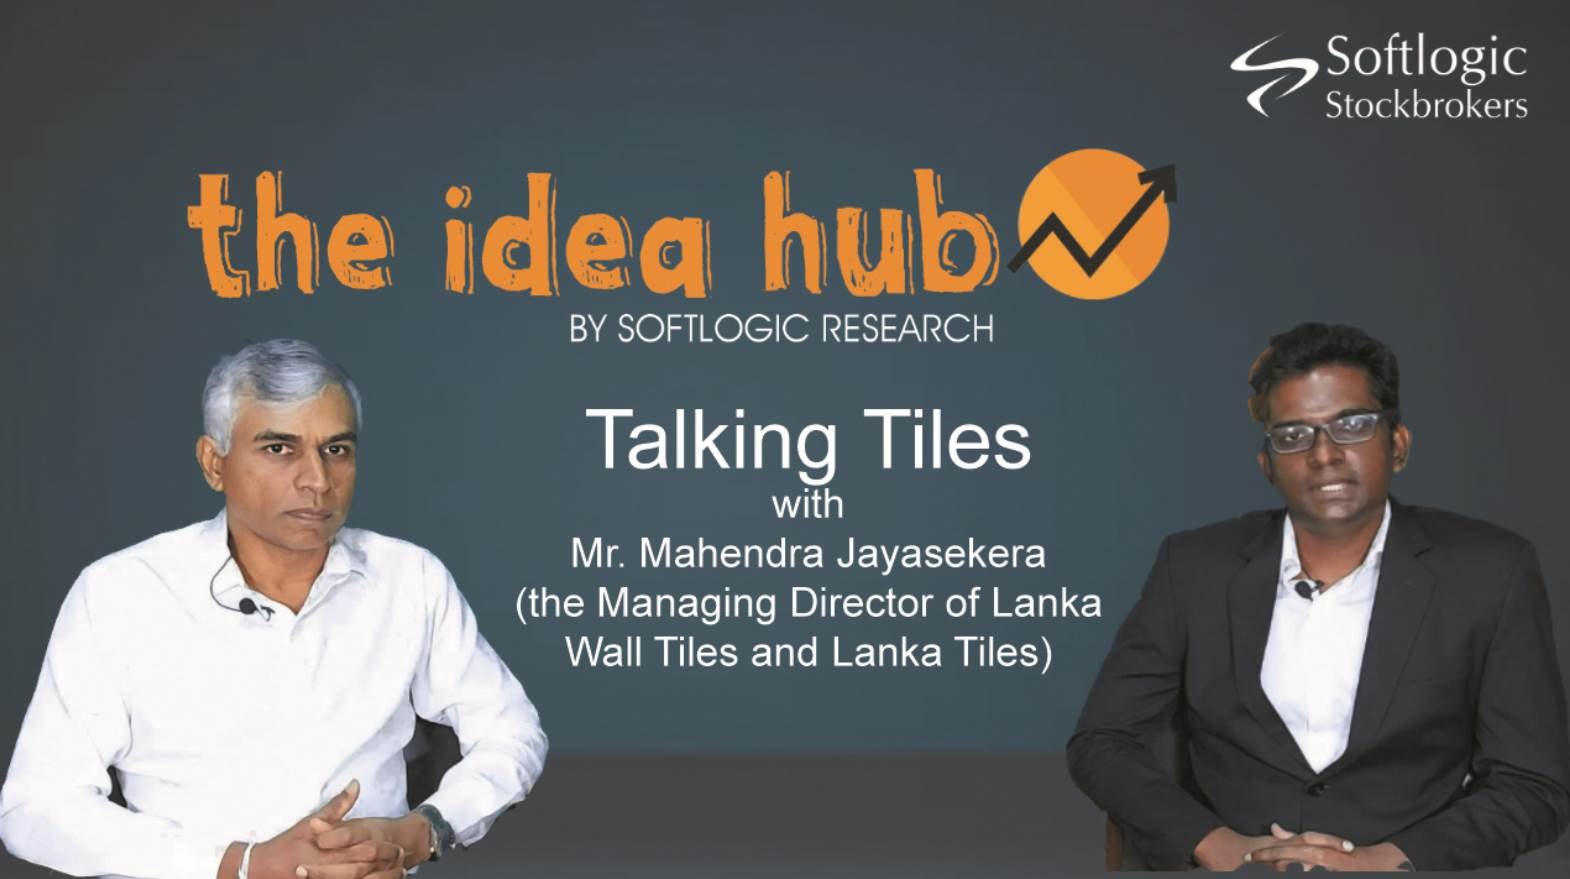 VIDEO: Discussion with Mahendra Jayasekera, MD of Lanka Tiles & Lanka Walltiles